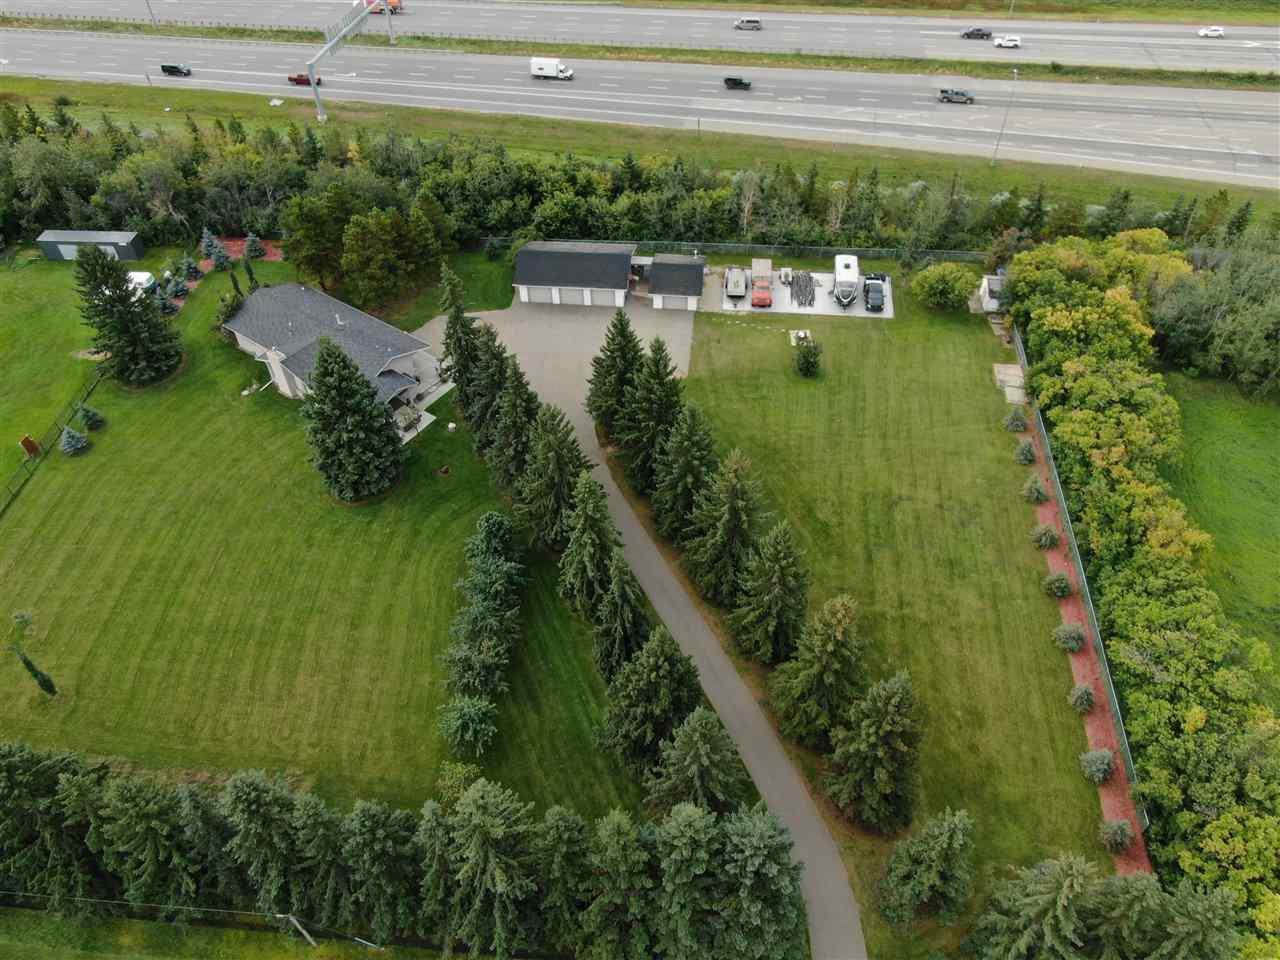 Main Photo: 18951 121 Avenue in Edmonton: Zone 40 House for sale : MLS®# E4173920